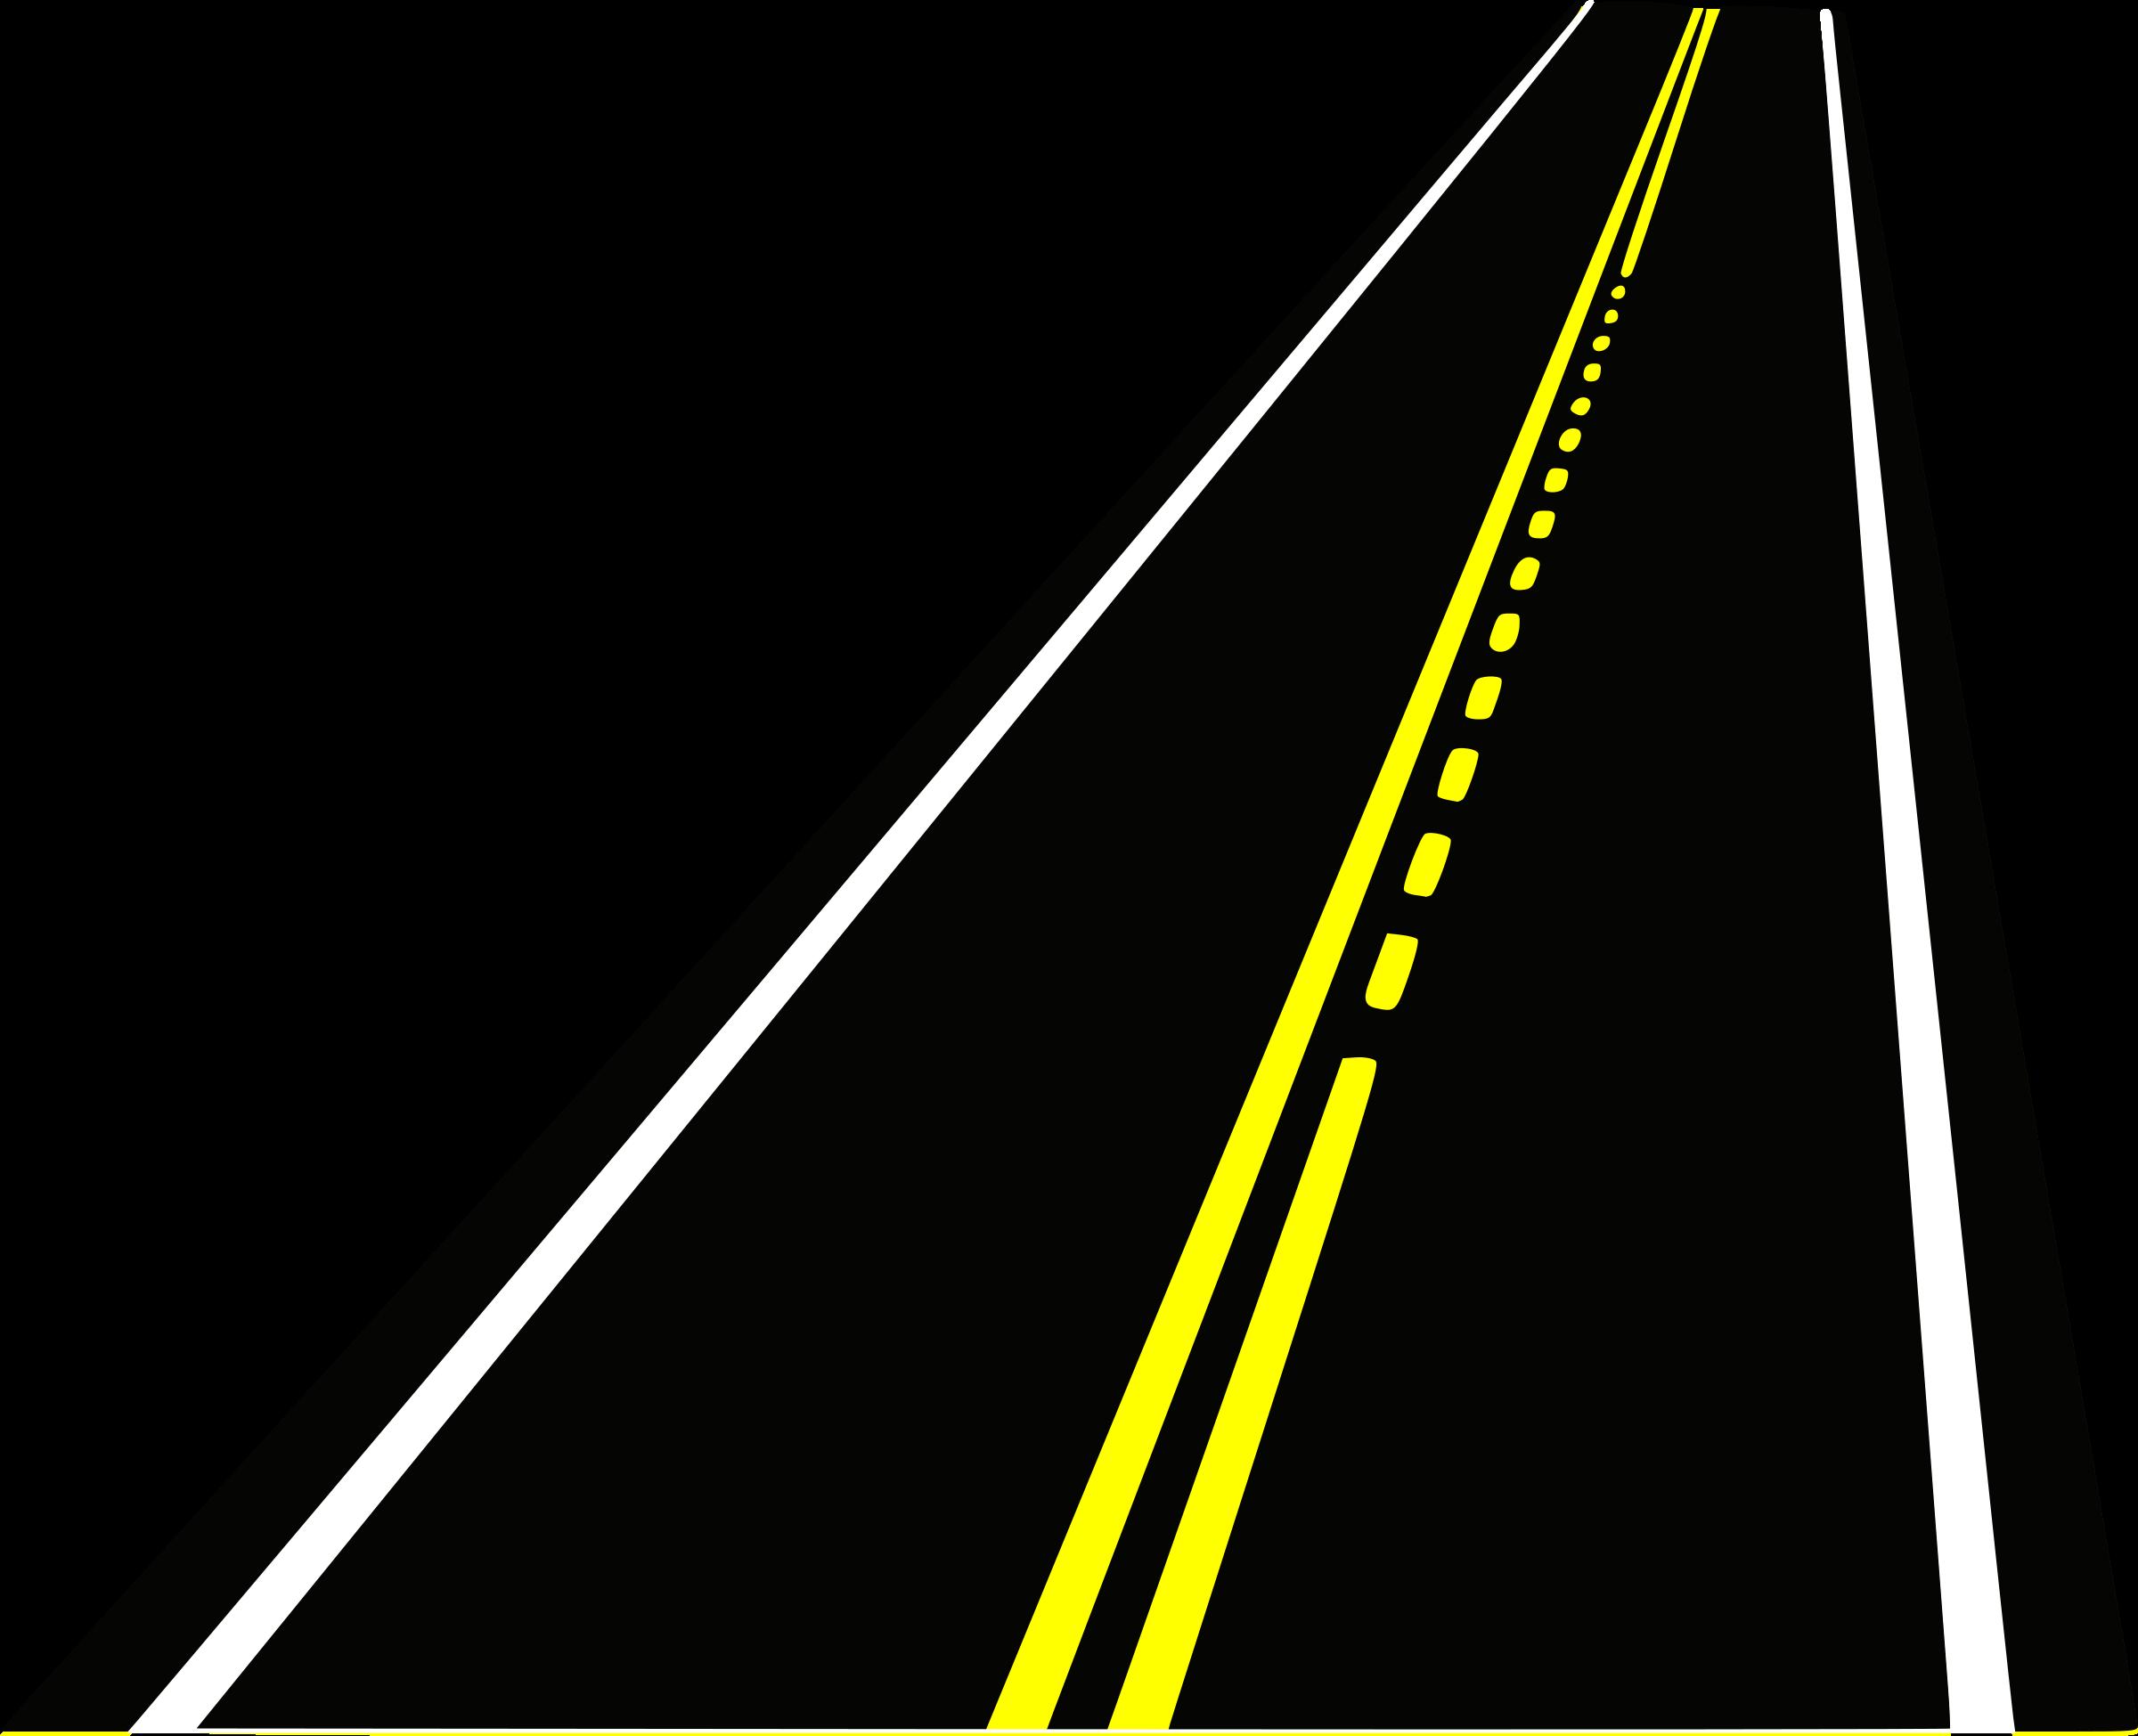 Road Background Clip Art Roadway 20clipa-Road Background Clip Art Roadway 20clipart-4